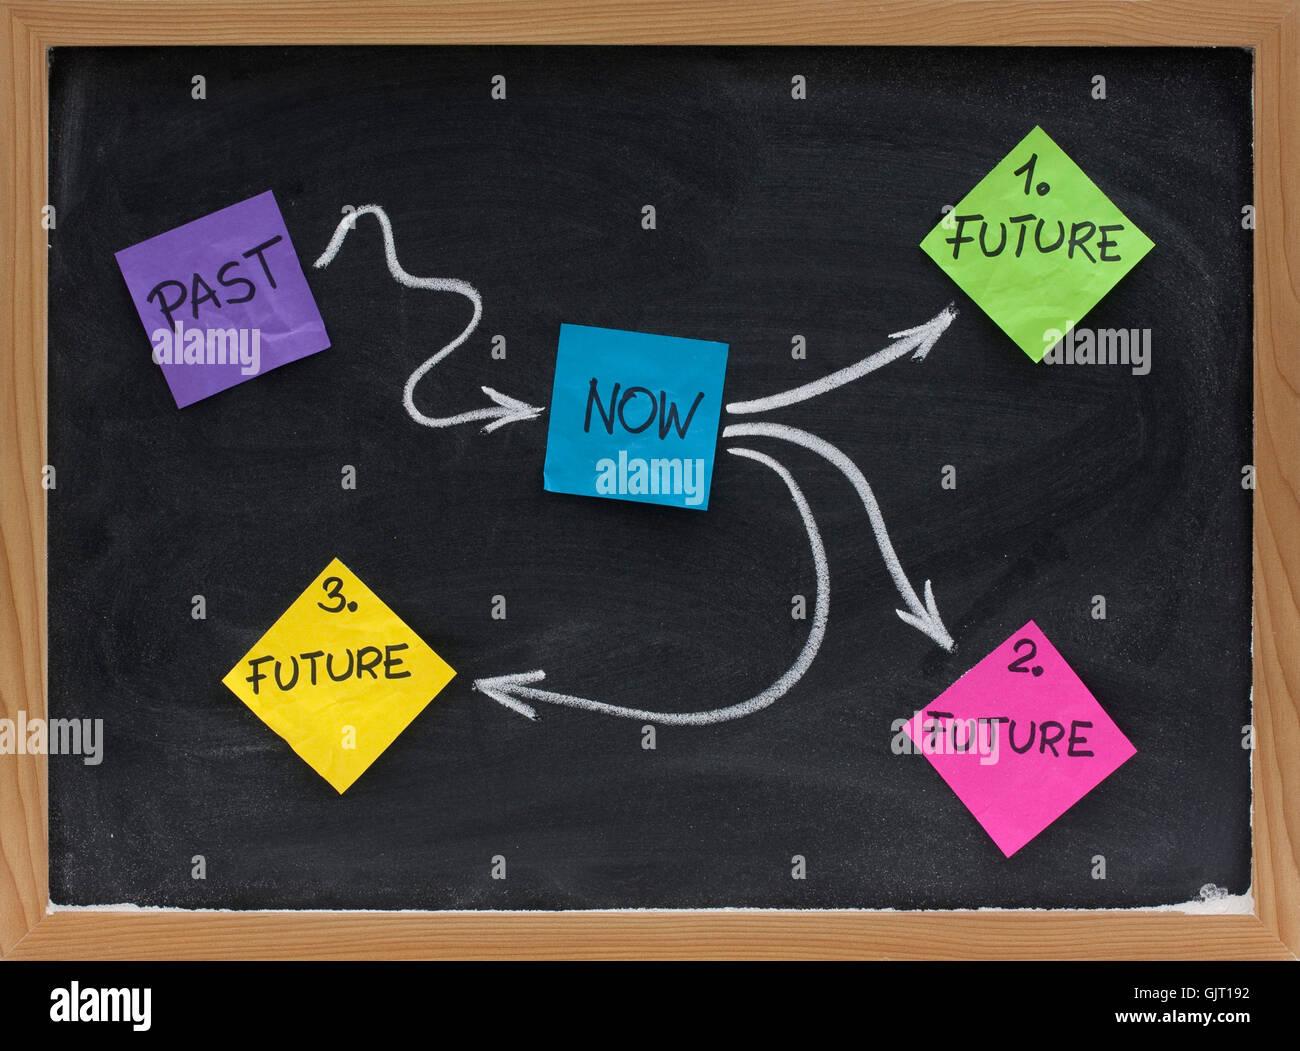 present future past - Stock Image